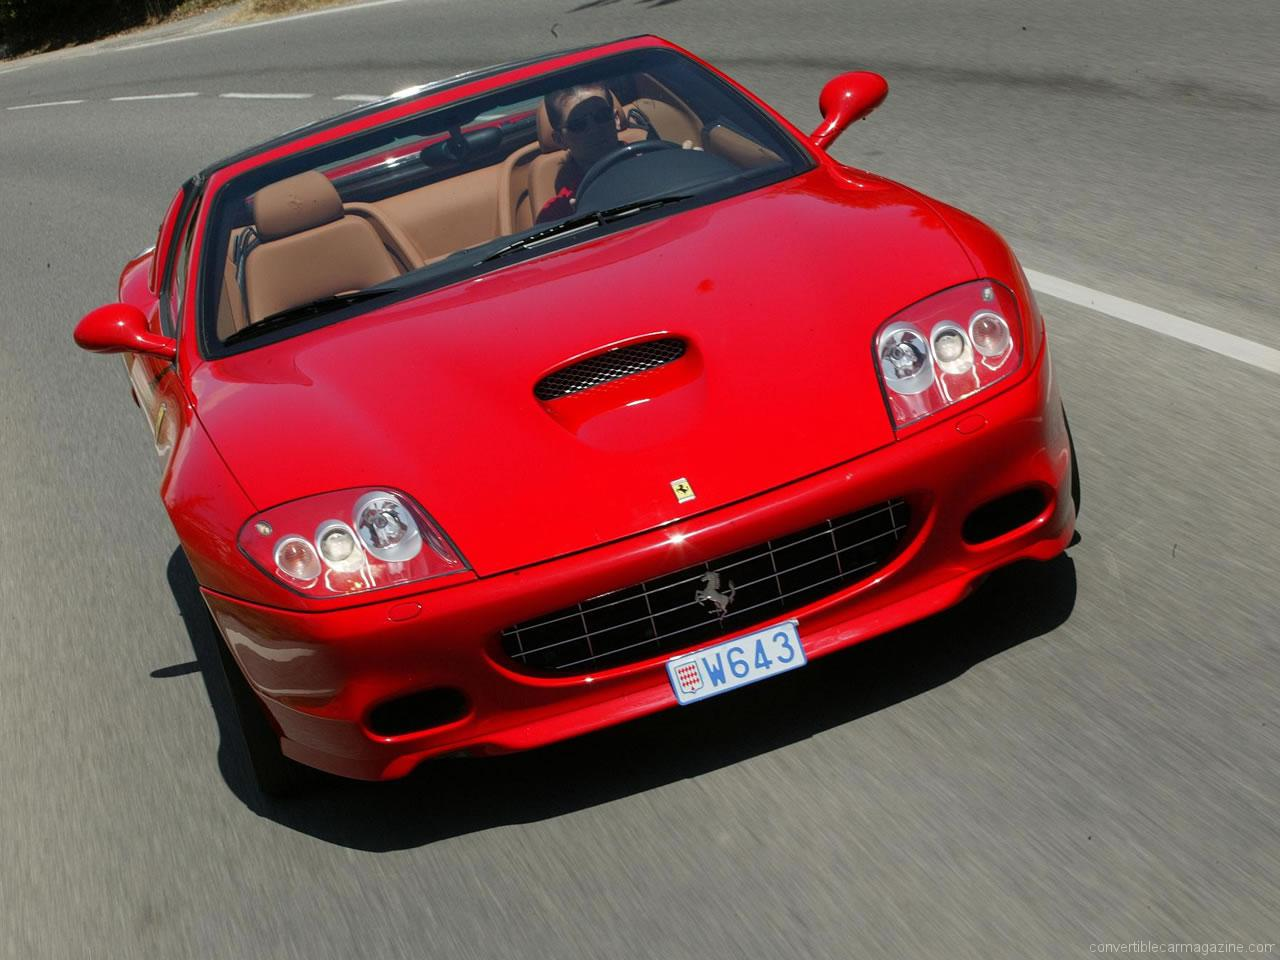 Ferrari 575m Superamerica Buying Guide